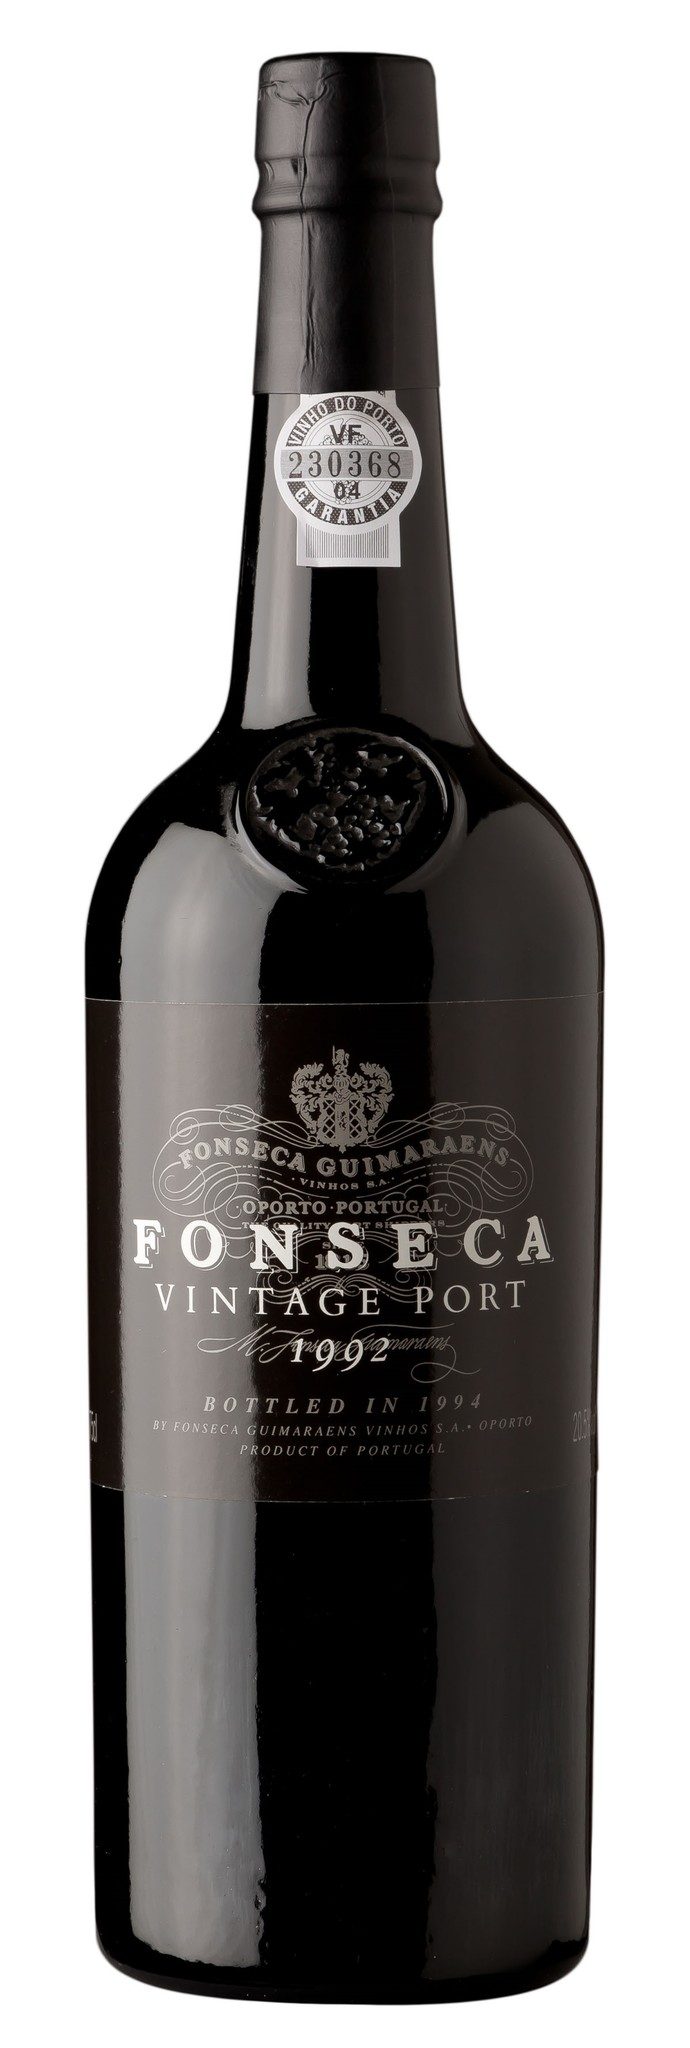 Fonseca, Porto 1992 Fonseca Vintage Port in wooden box